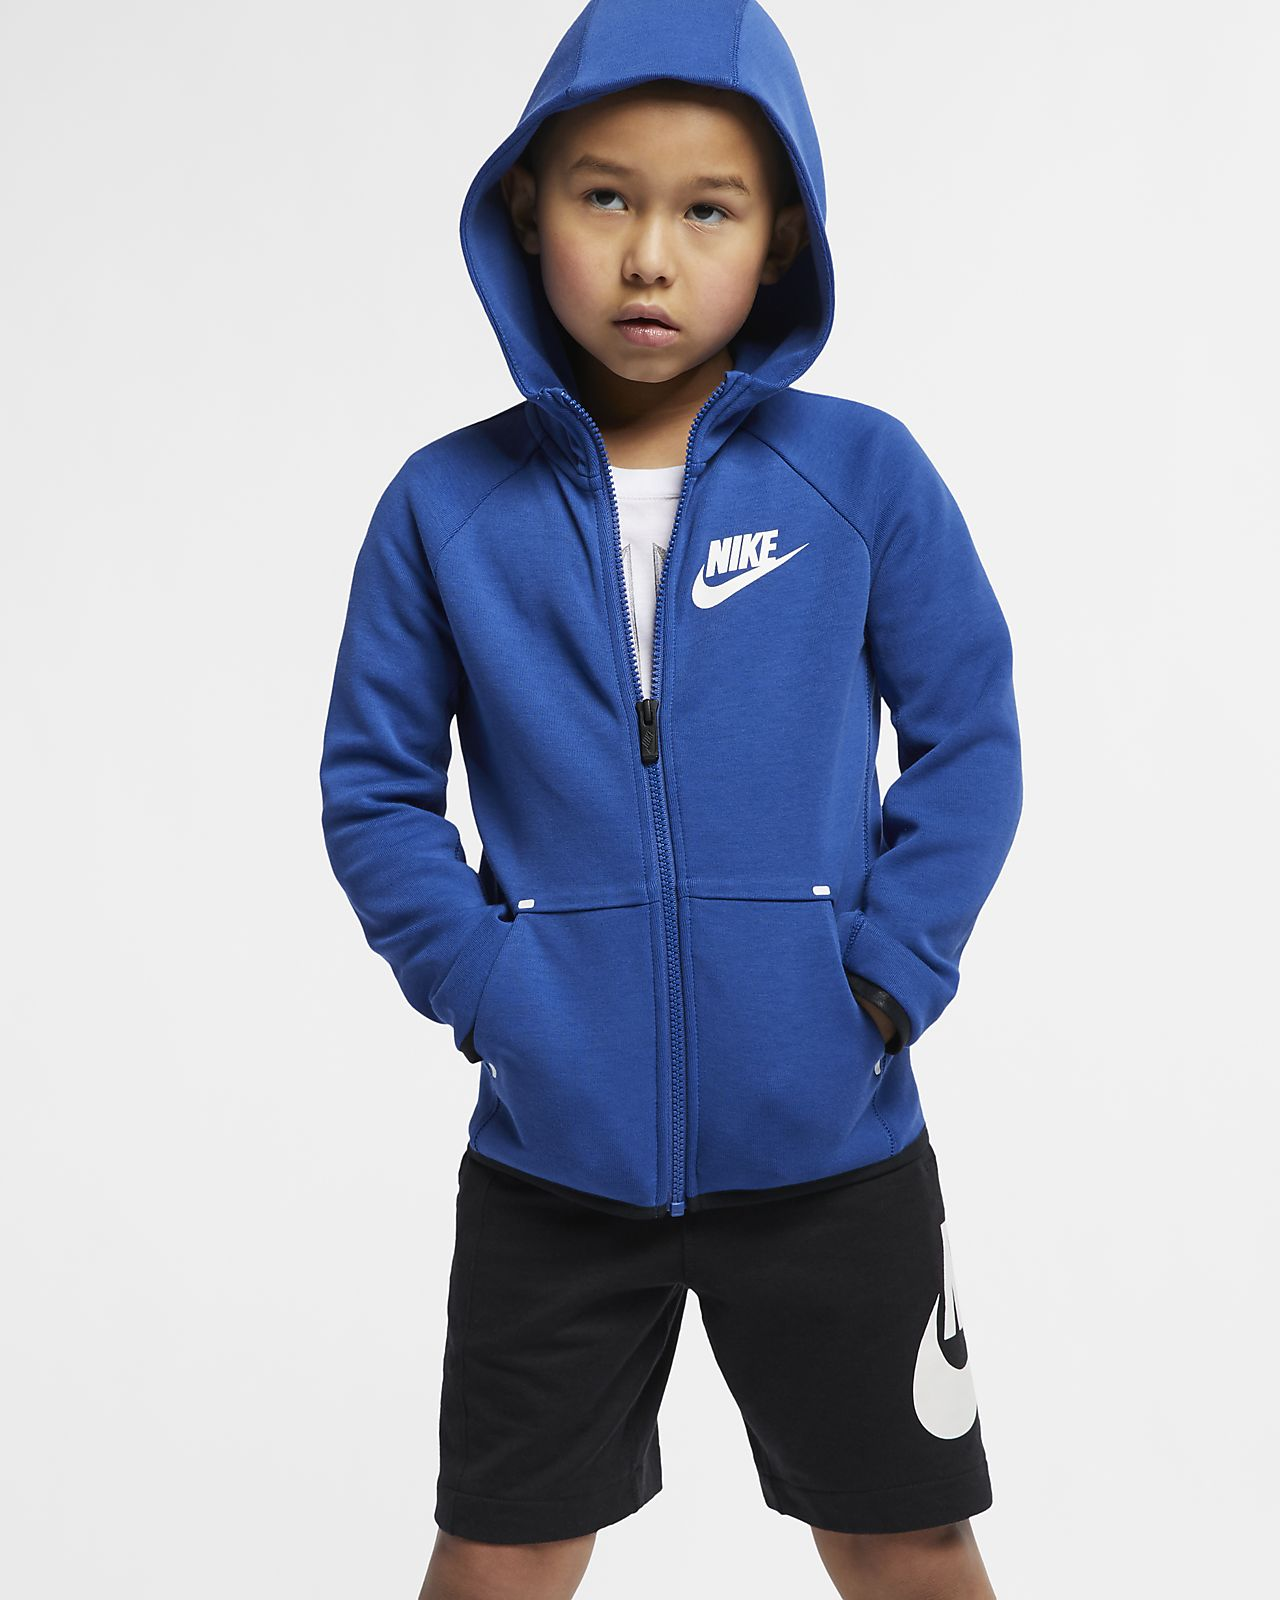 Huvtröja Nike Sportswear Tech Fleece för barn